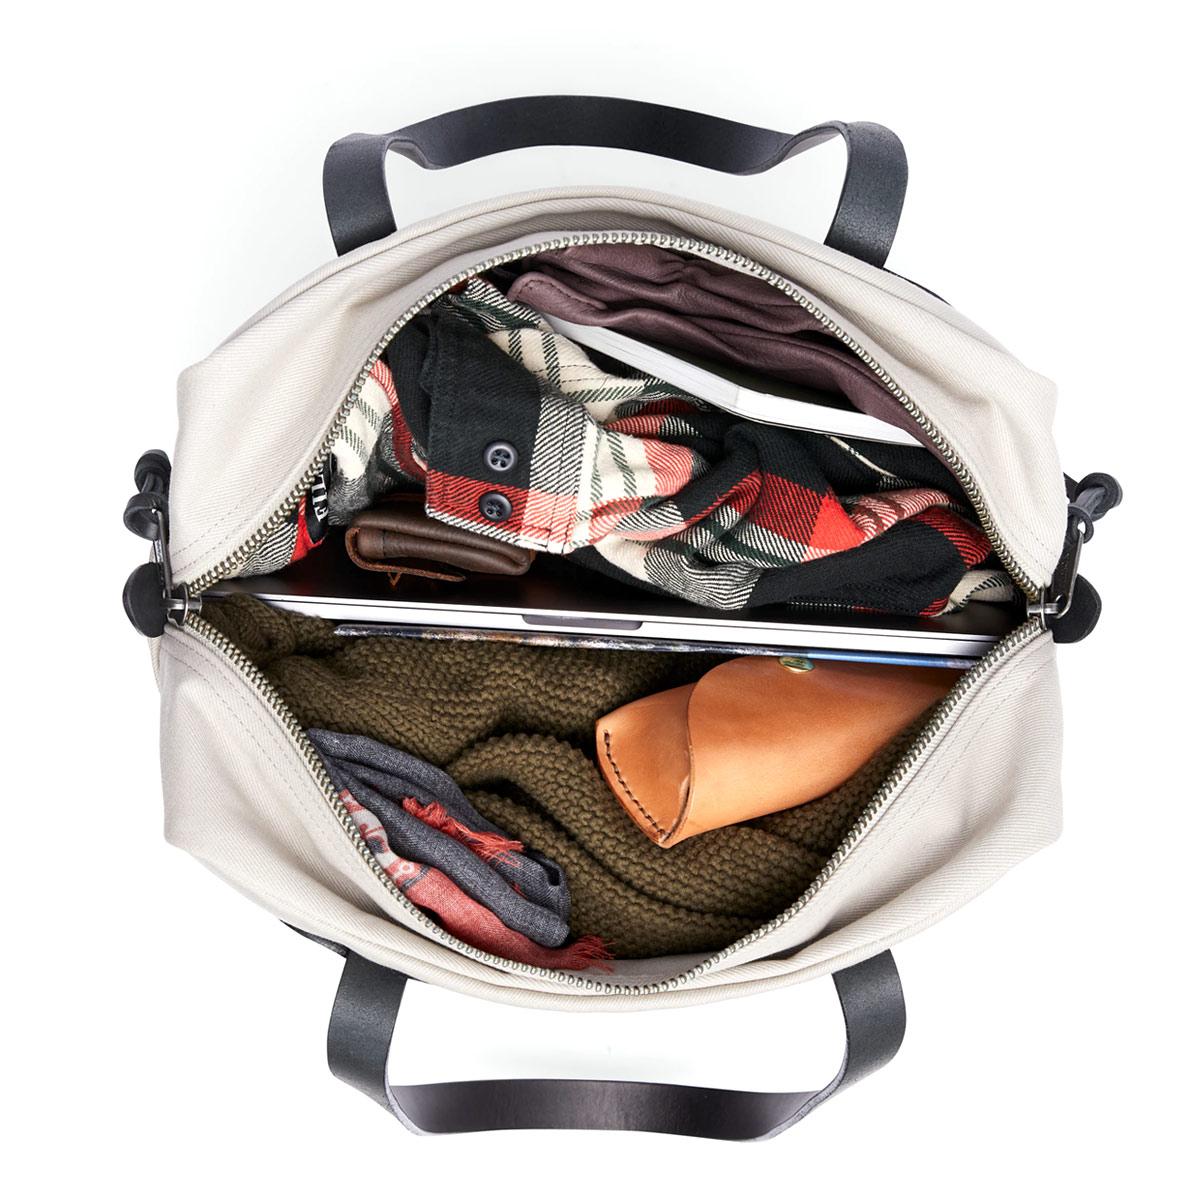 Filson Rugged Twill Tote Bag With Zipper 11070261-Twine, legendarische Tote Bag voor on the go